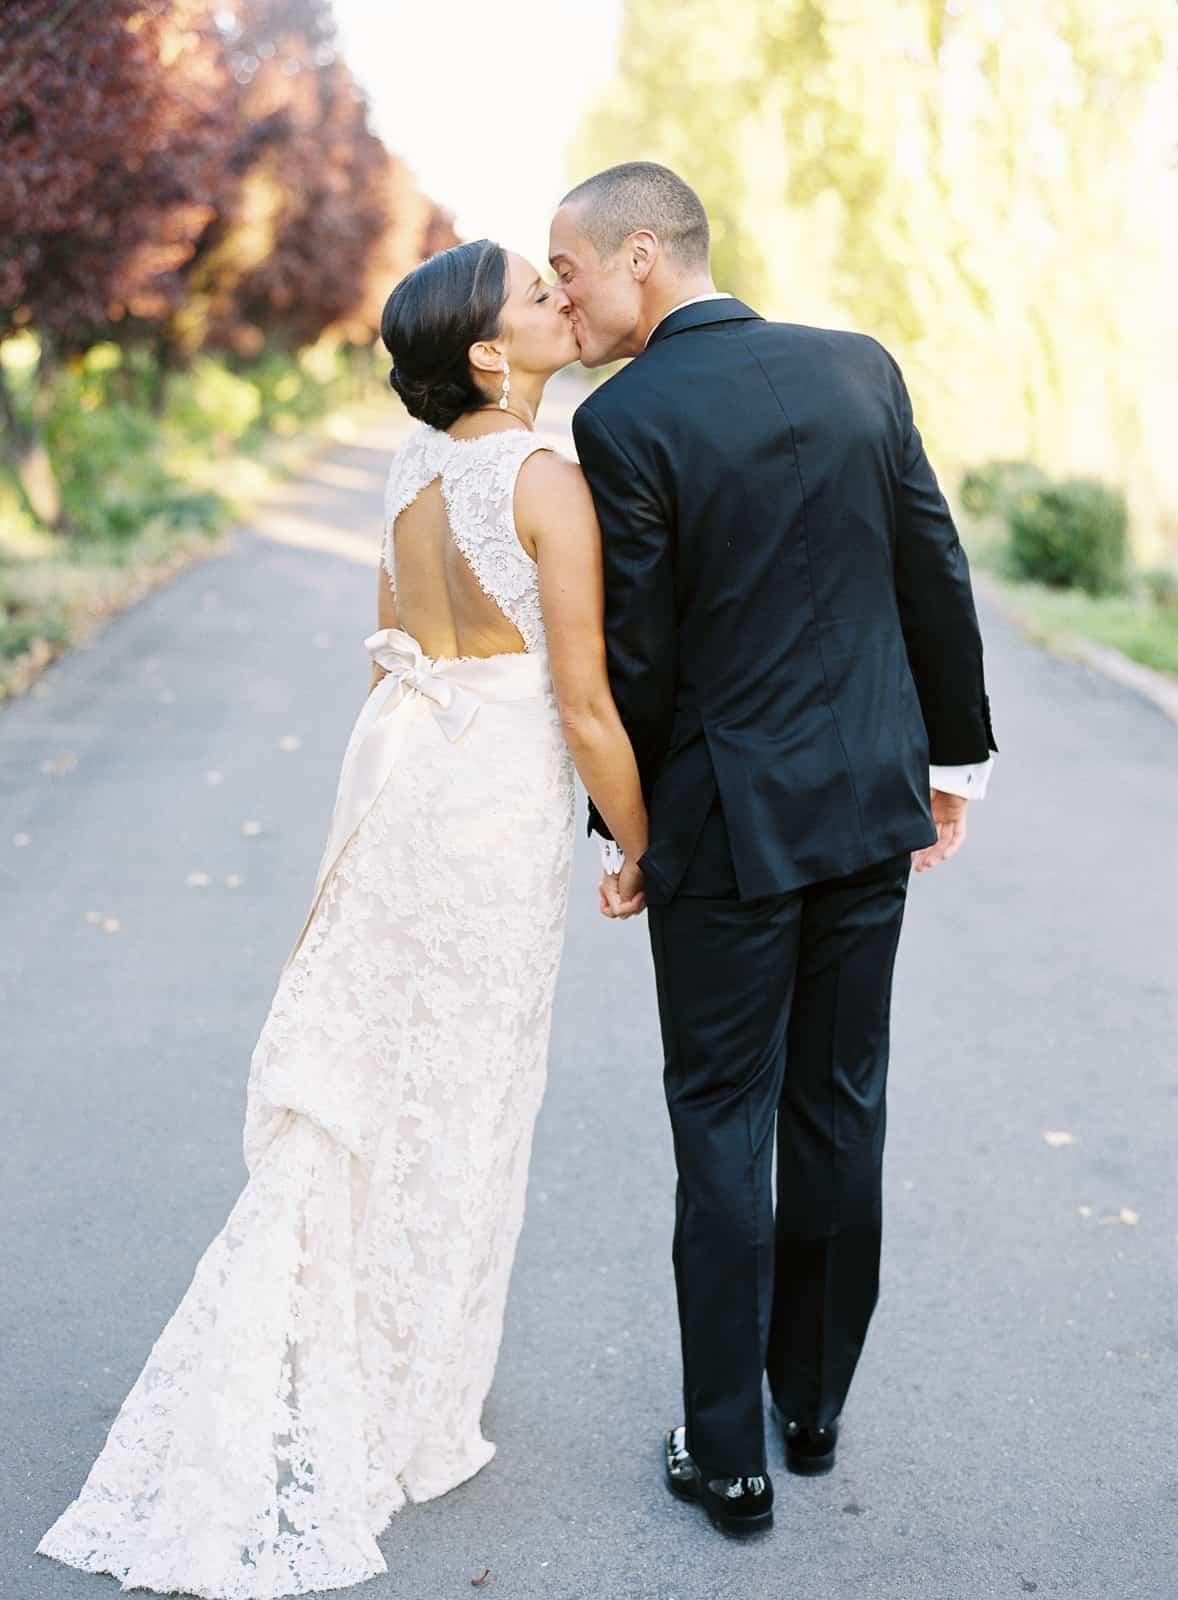 Timeless wedding portrait